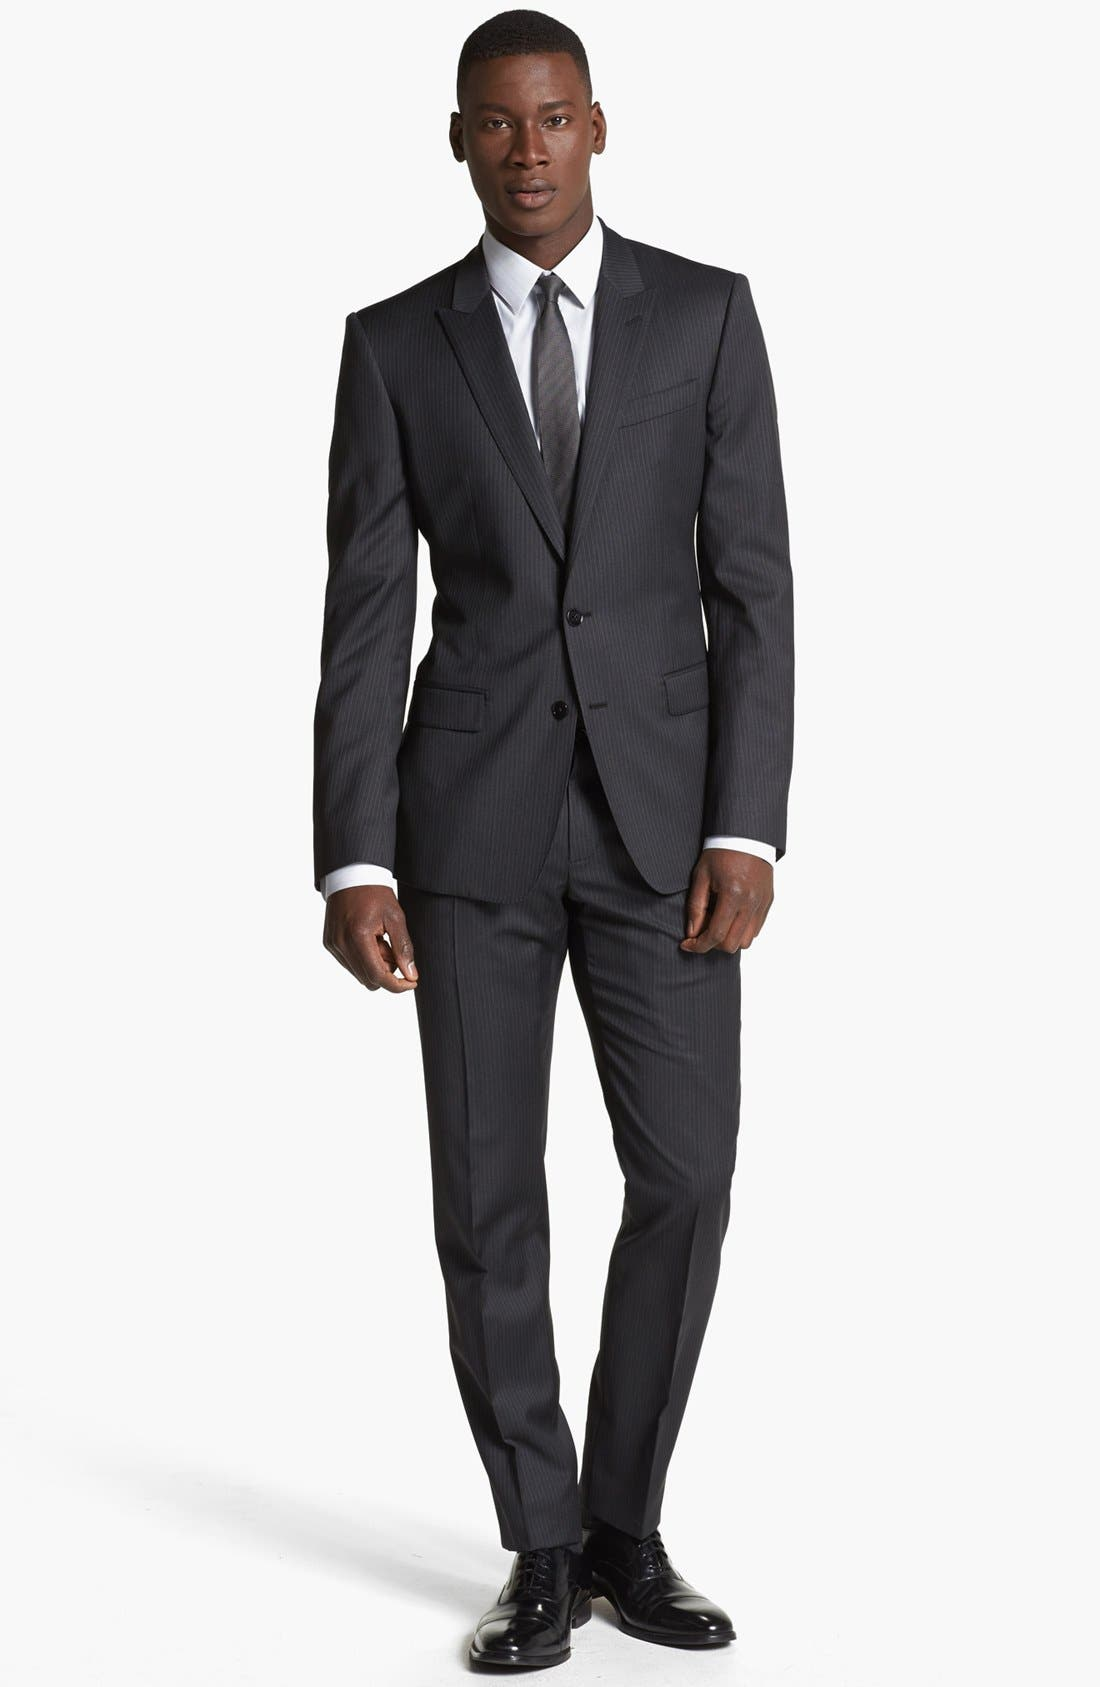 Main Image - Dolce&Gabbana 'Martini' Pinstripe Wool Suit